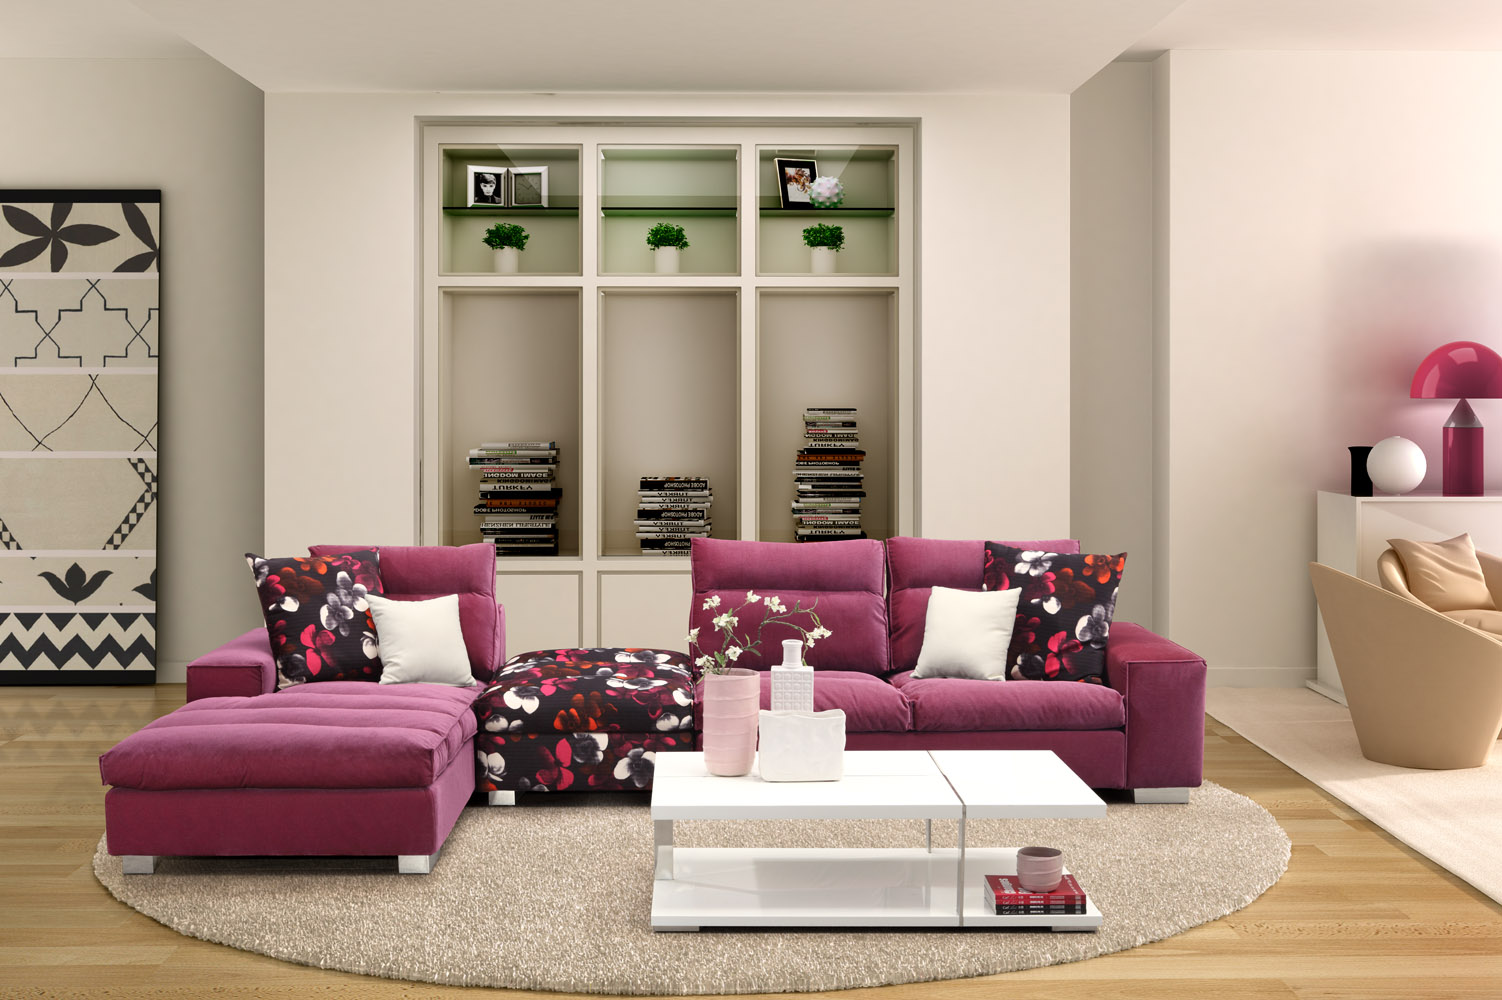 3d interior design for living room - 3d Interior Room Design